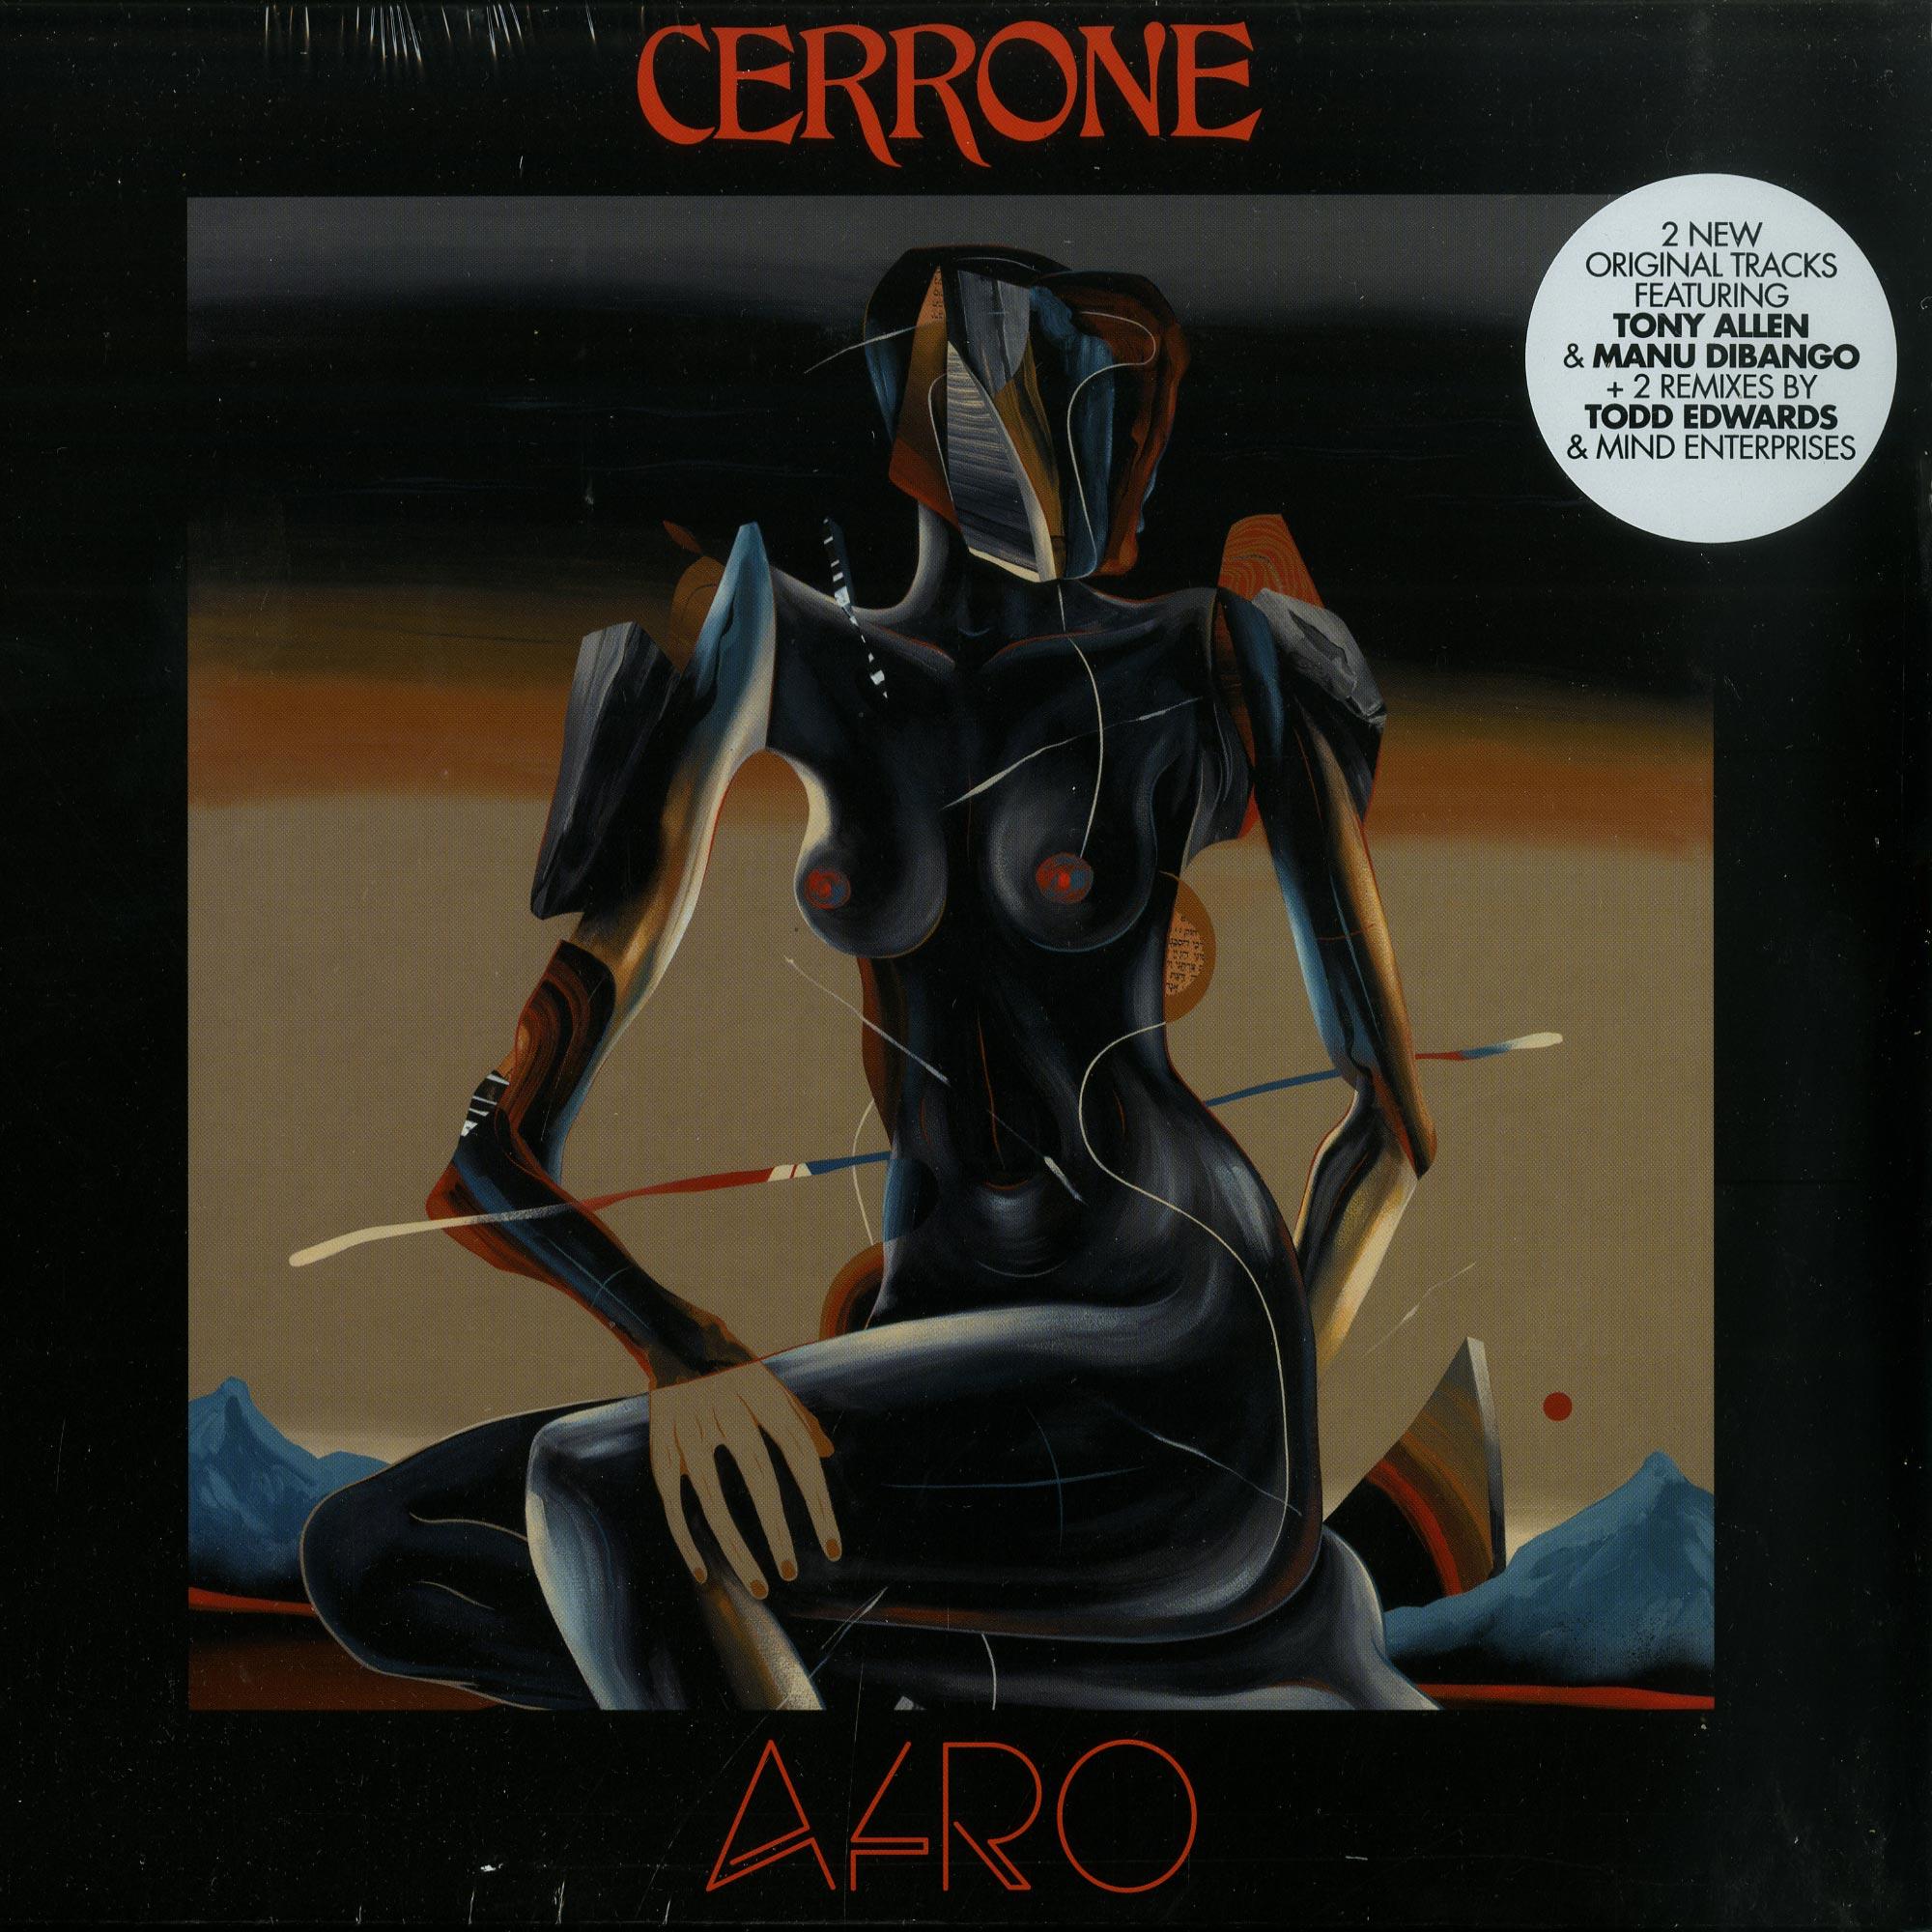 Cerrone ft. Tony Allen & Manu Dibango - AFRO